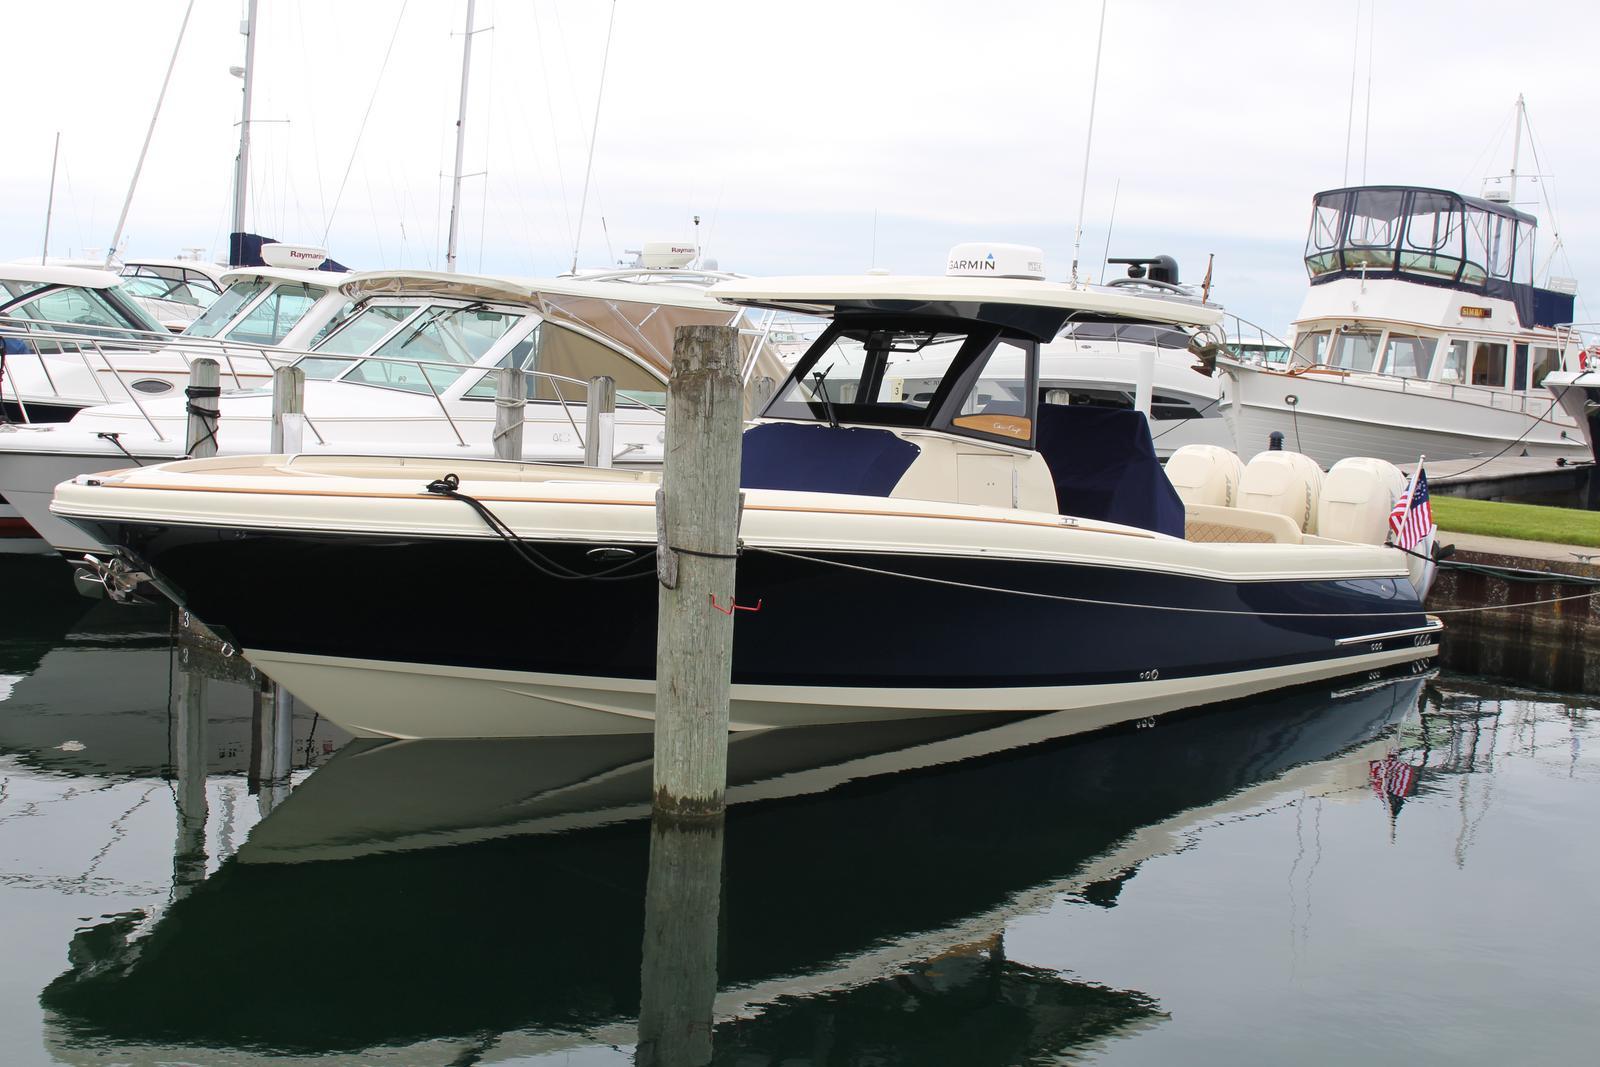 2019 Chris Craft Catalina 34 for sale in Harbor Springs, MI